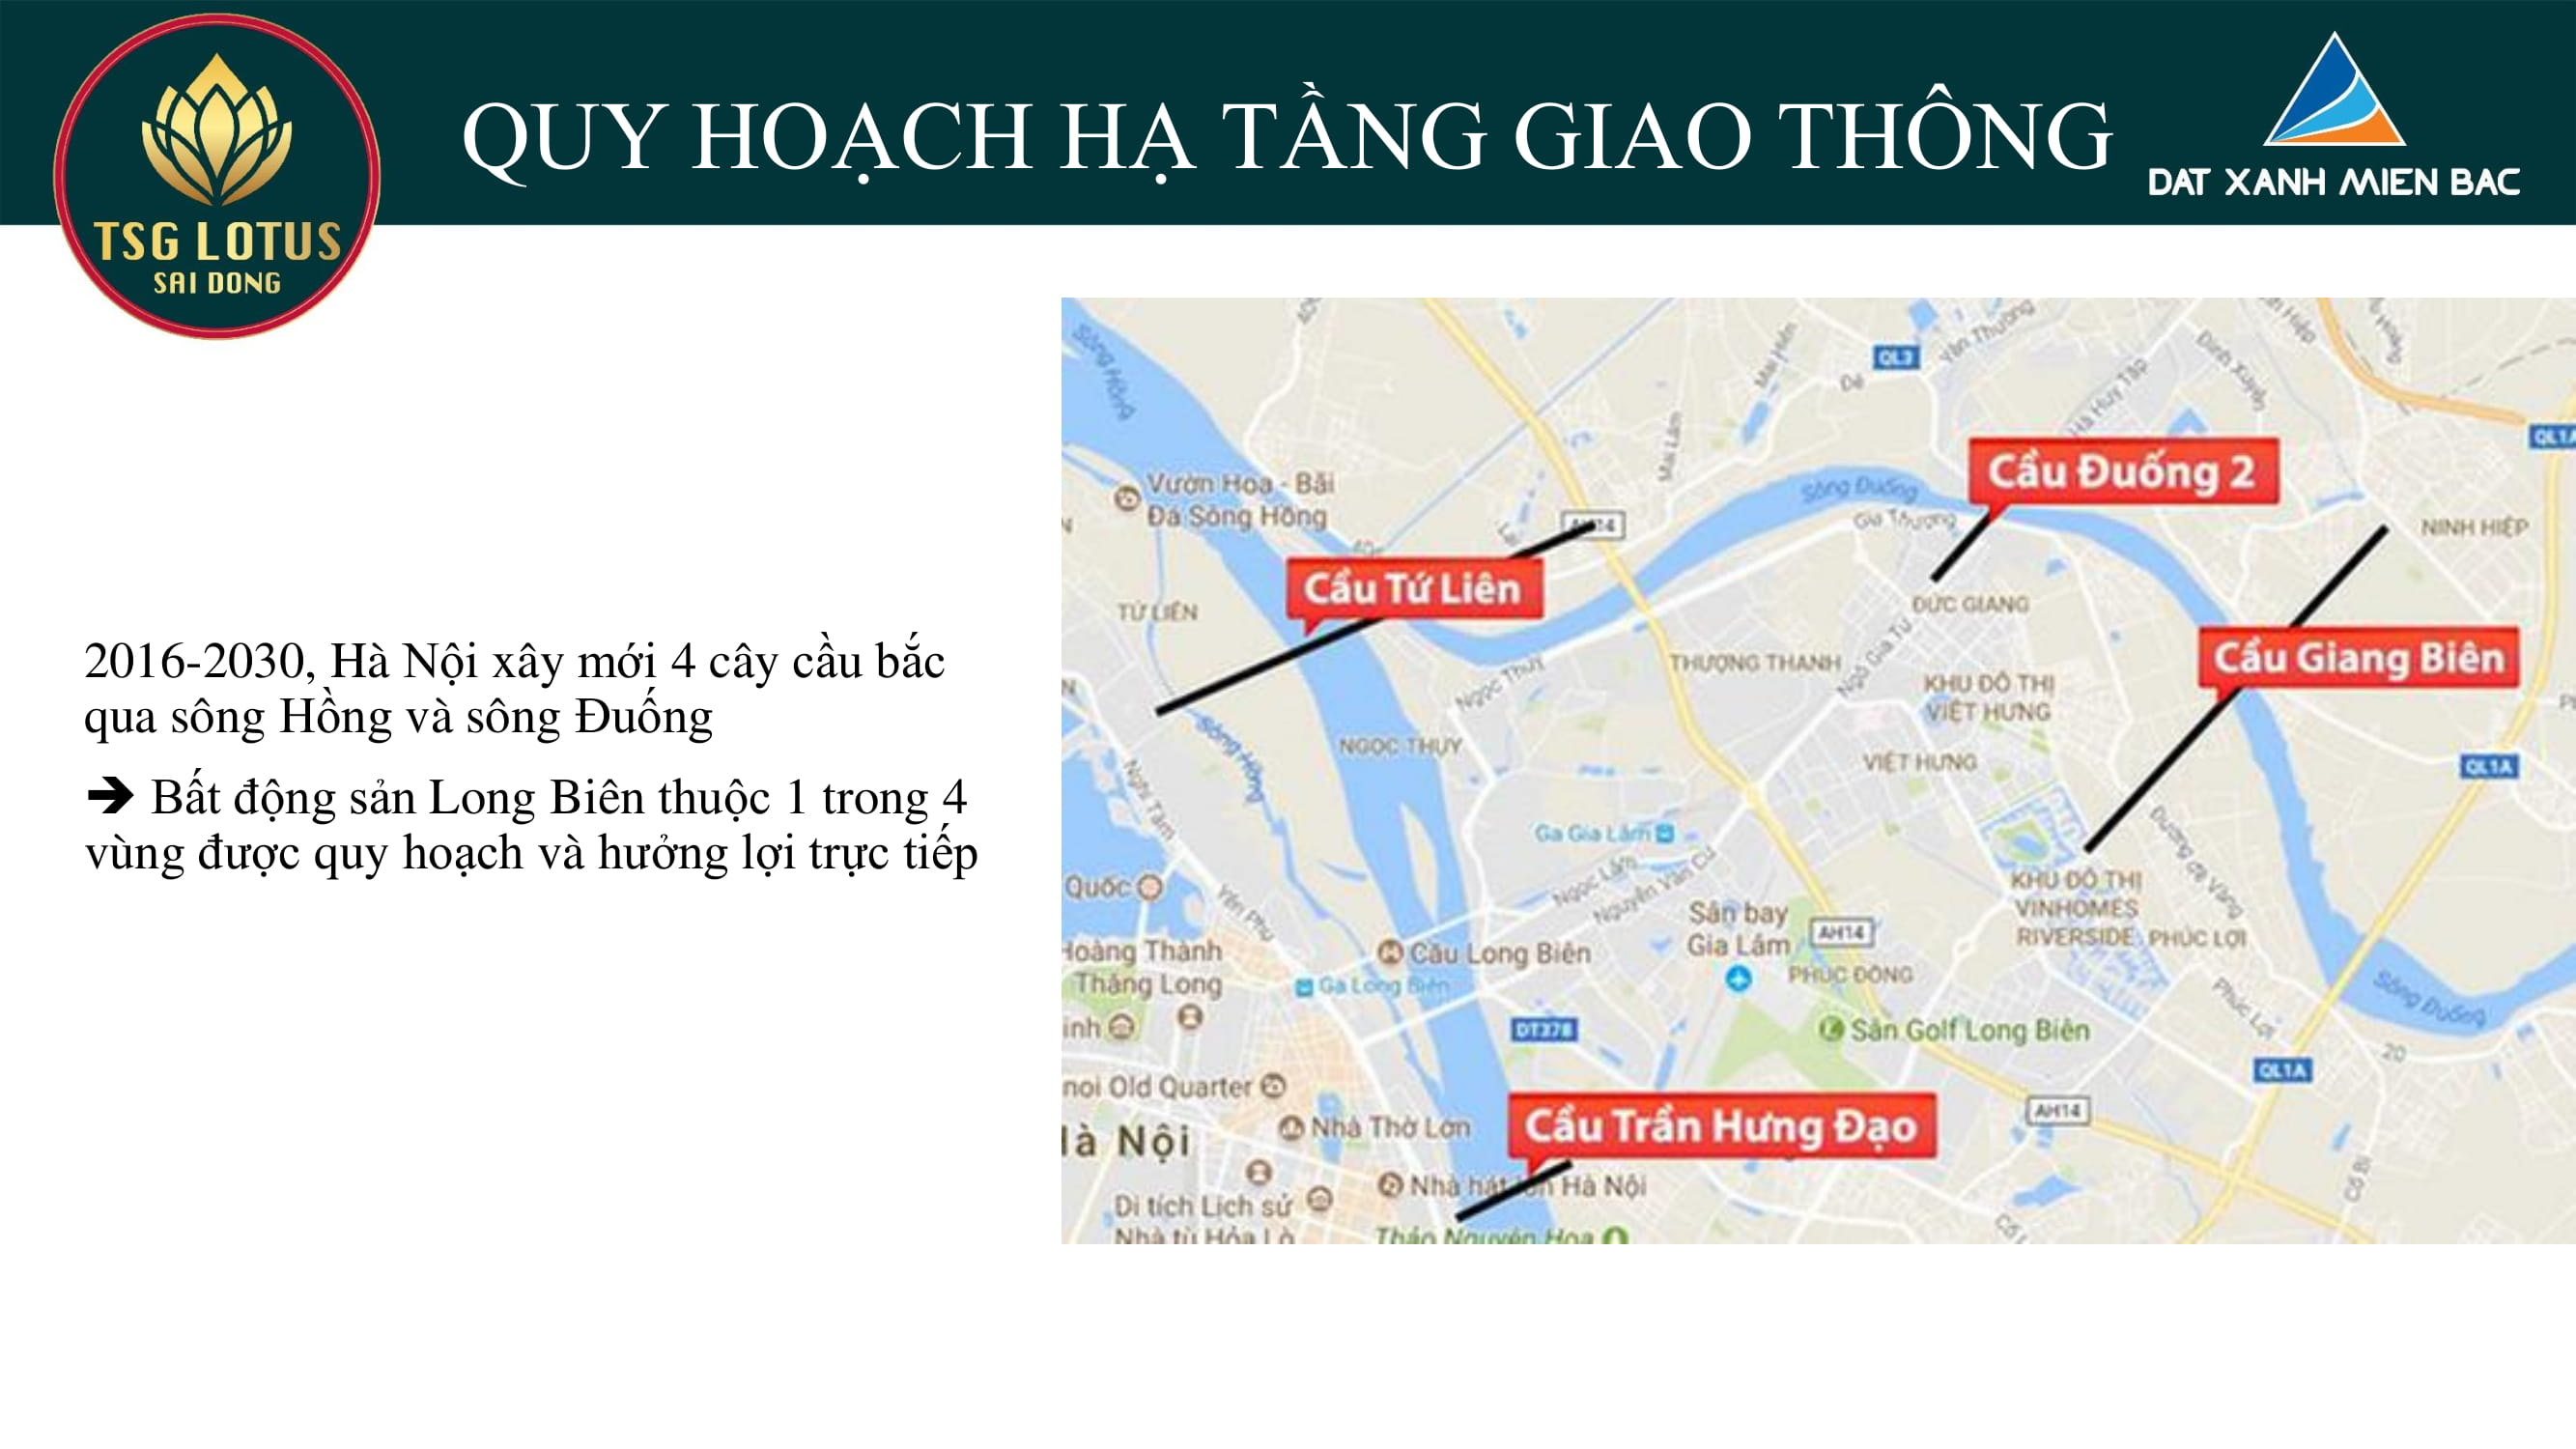 File training TSG Lotus Sai Dong-07 - Copy